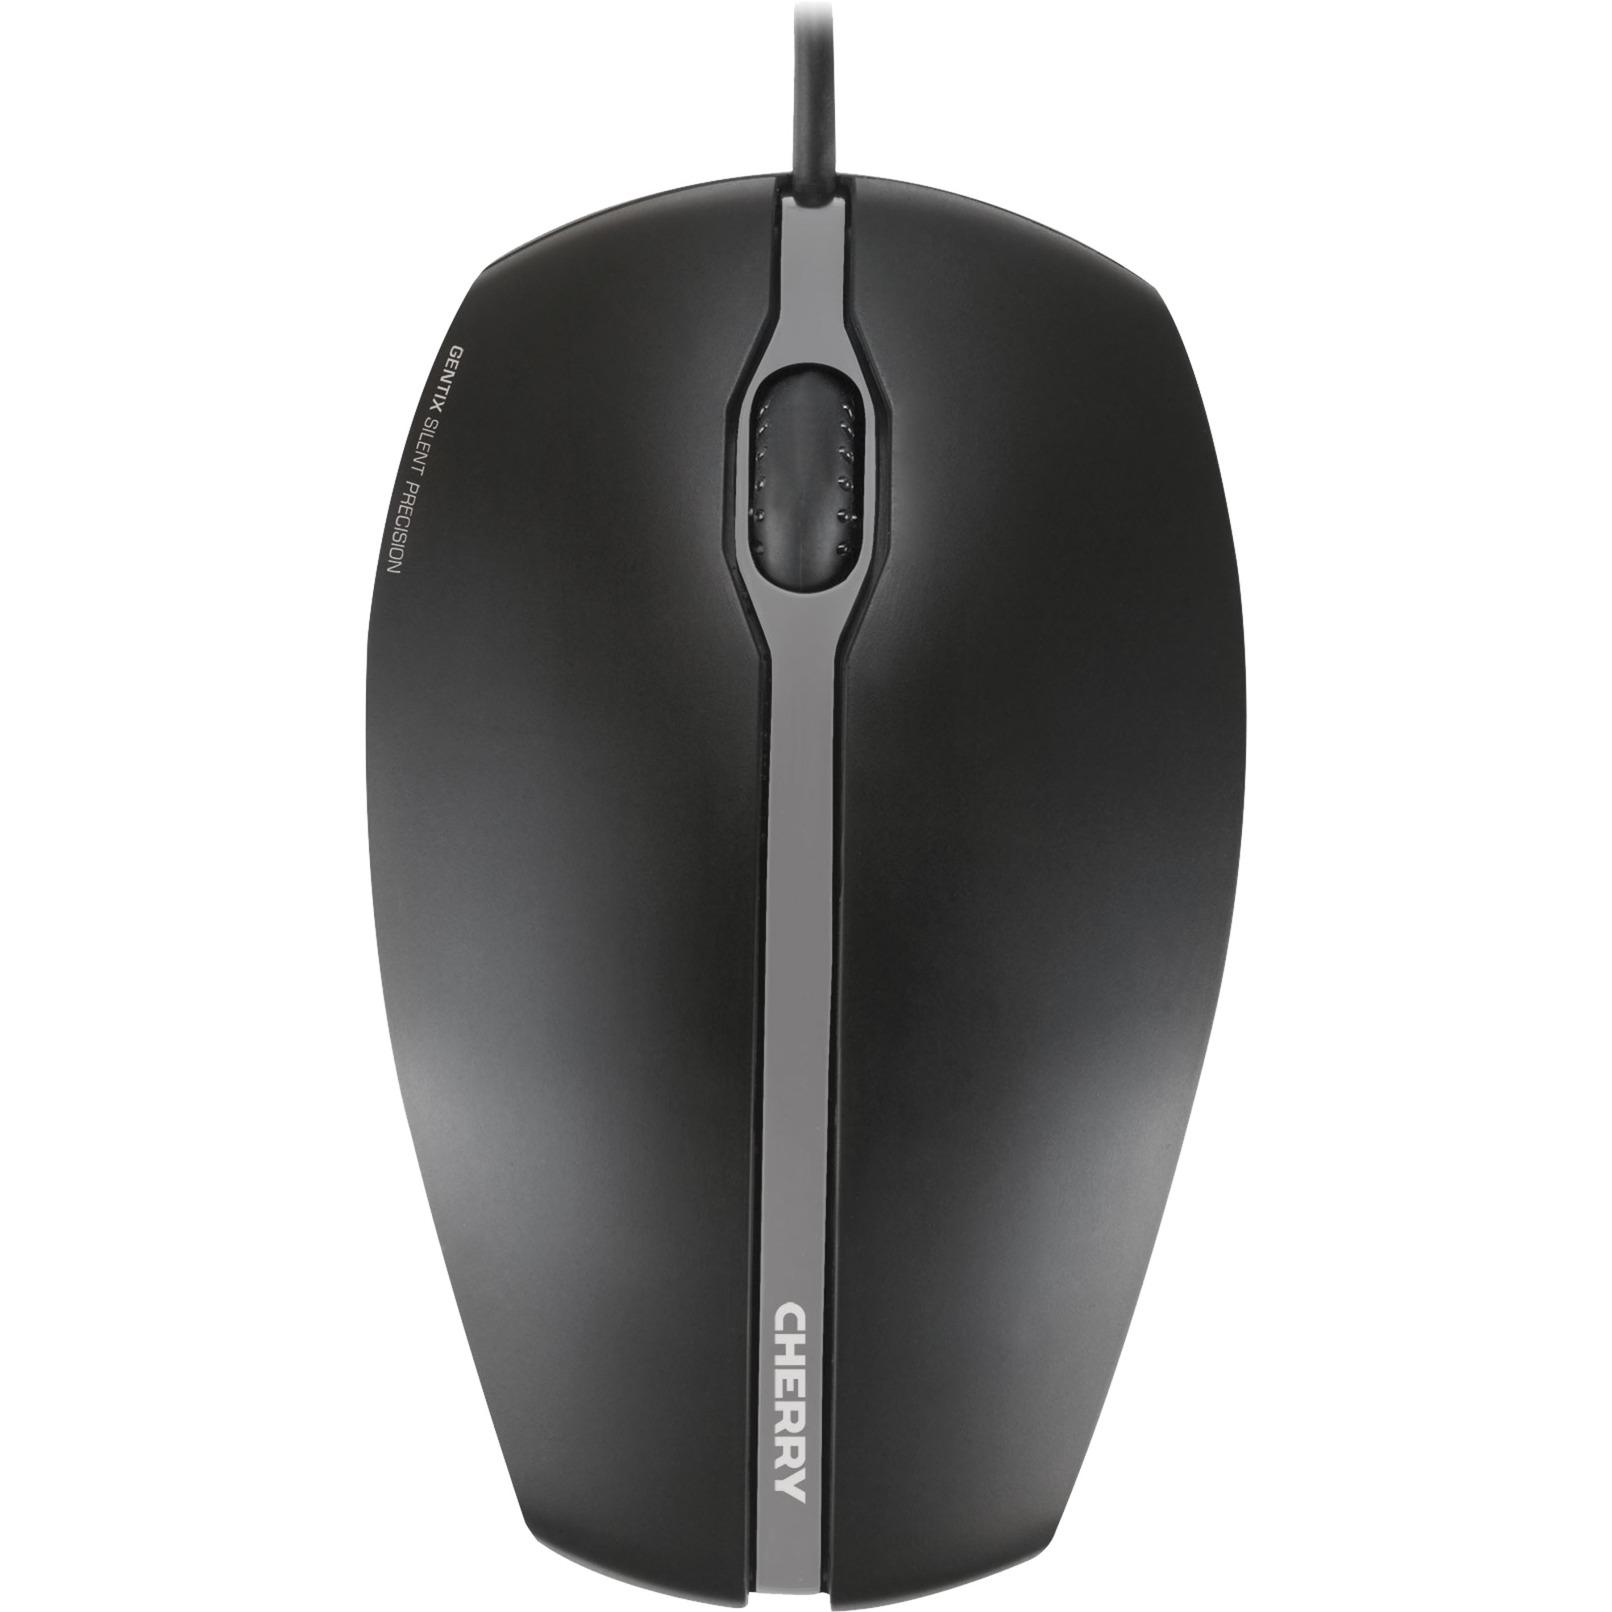 Gentix Silent USB Óptico 1000DPI Ambidextro Negro ratón